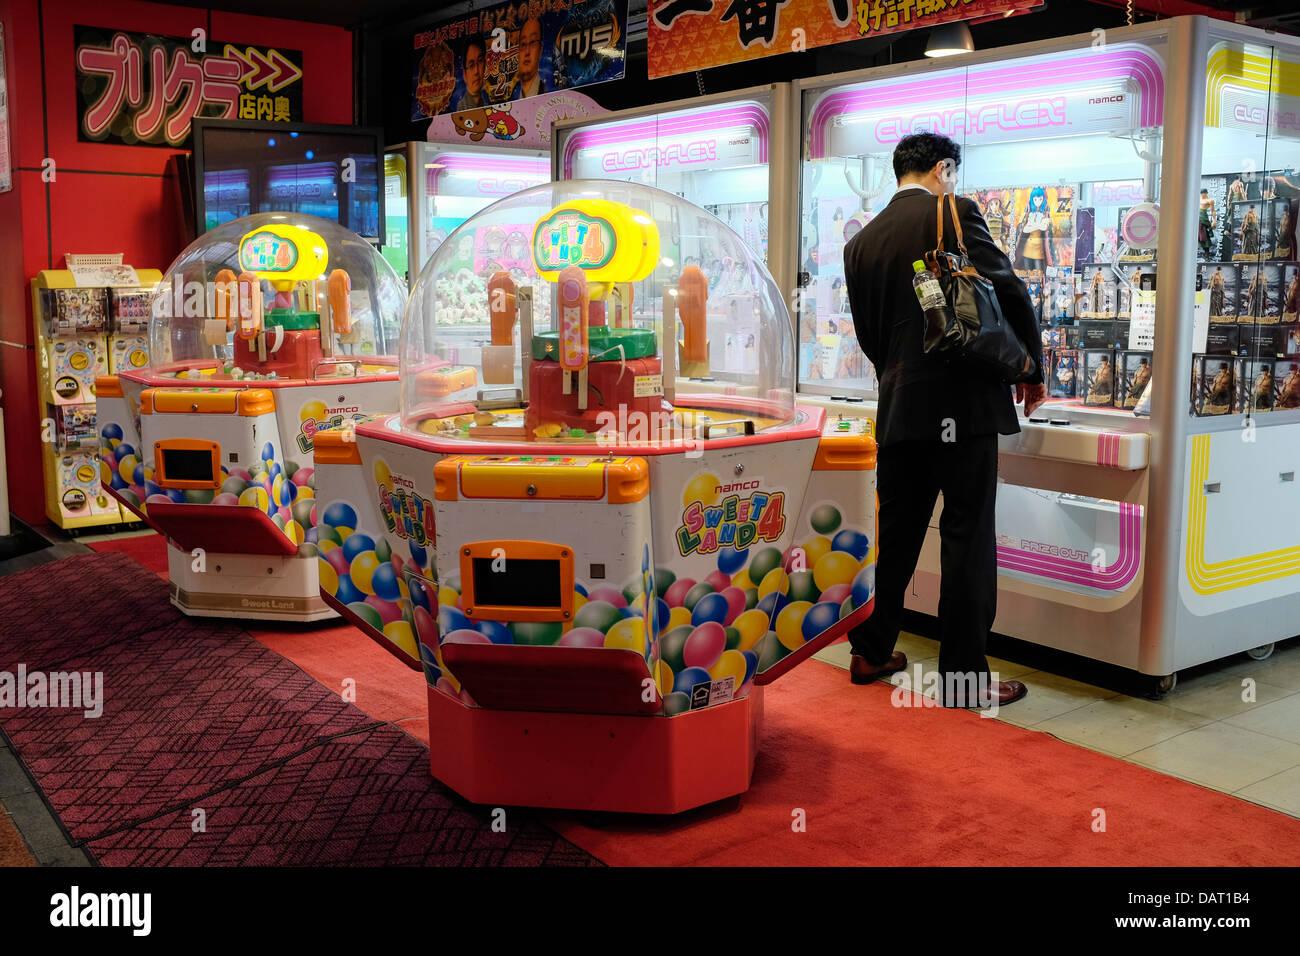 A Japanese Businessman playing an Arcade Claw Crane Game, Dotonburi, Osaka, Japan - Stock Image